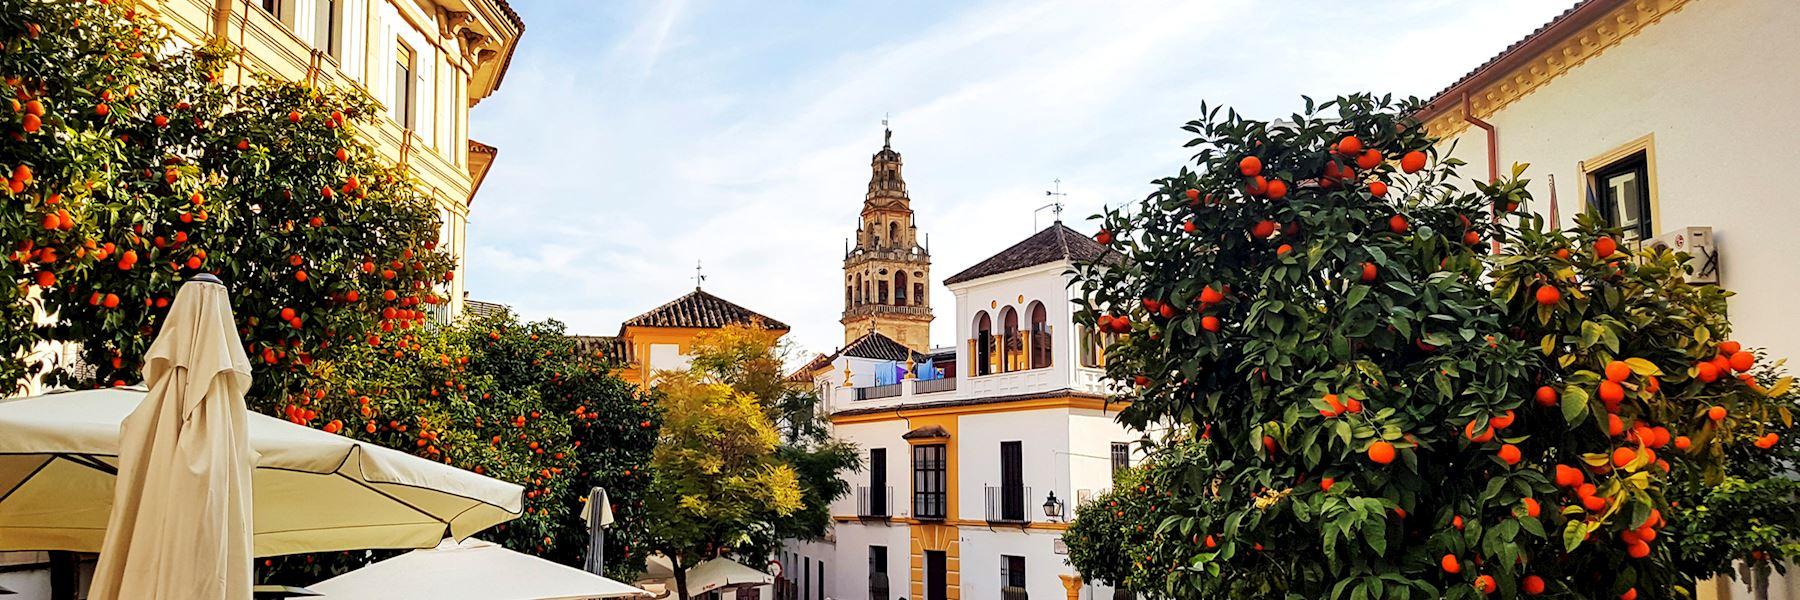 Visit Seville, Spain